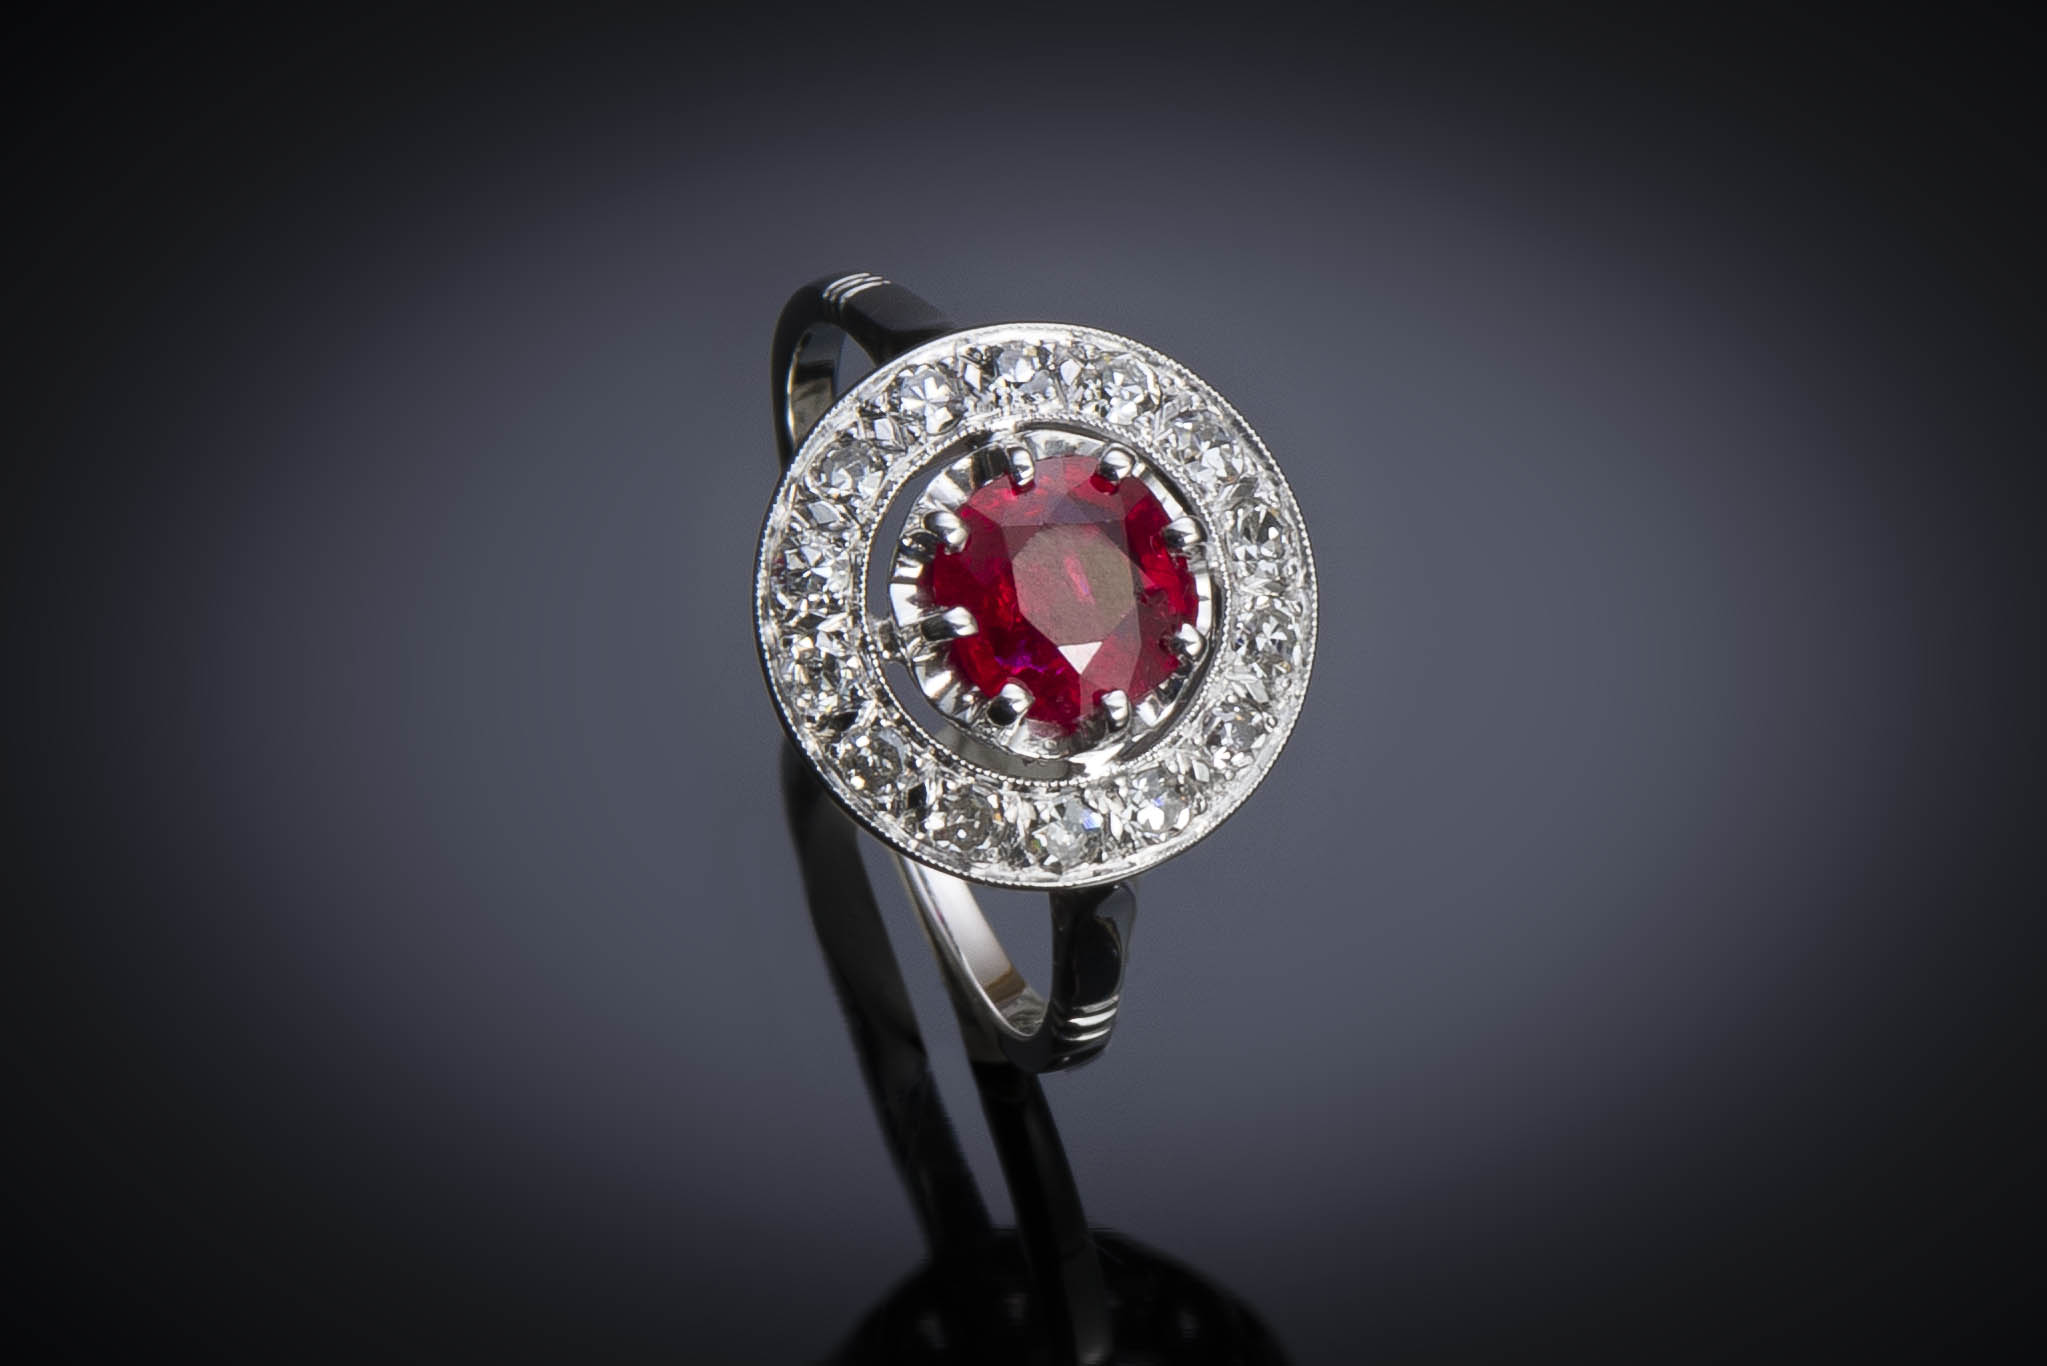 Bague Art Déco rubis birman naturel, rouge profond (certificat LFG) diamants-1